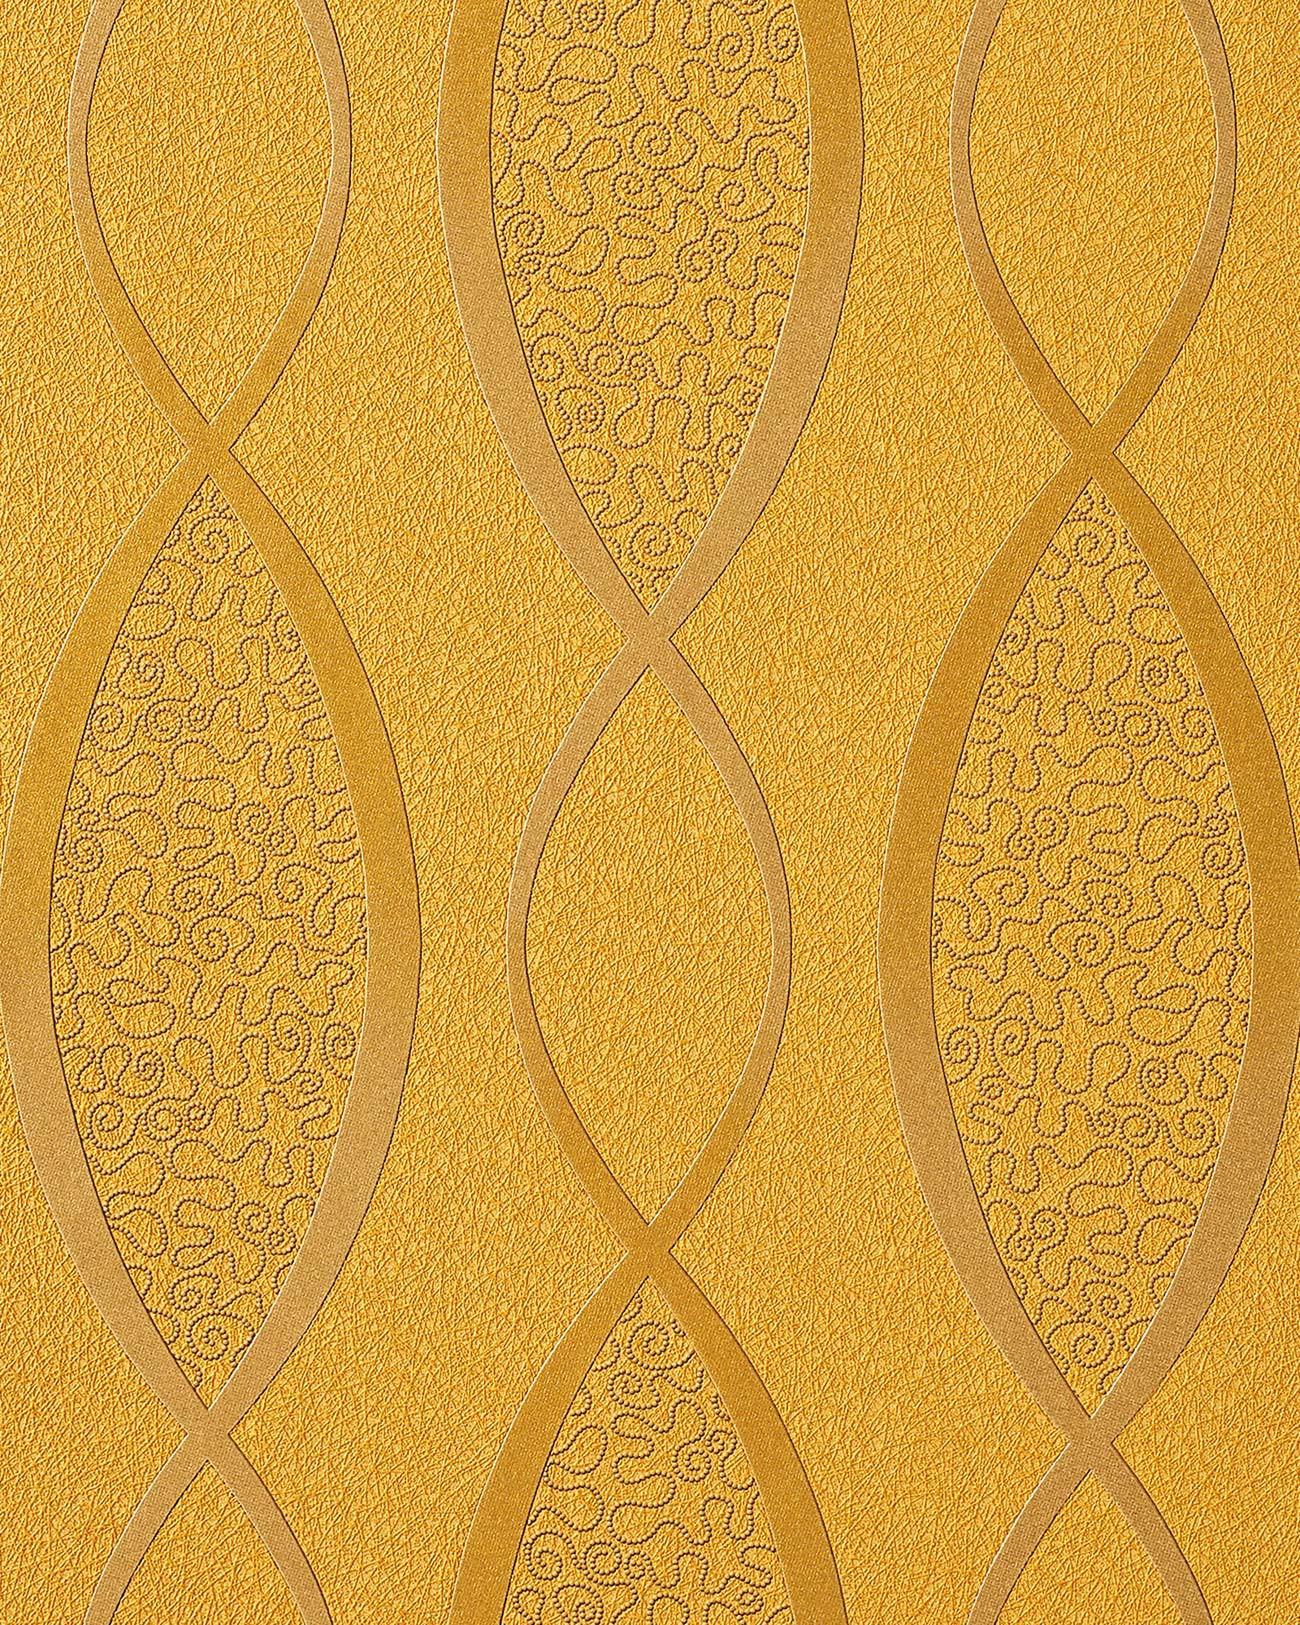 70s style textured vinyl wallcovering wallpaper fashion stripes curved lines retro edem 1018 11. Black Bedroom Furniture Sets. Home Design Ideas